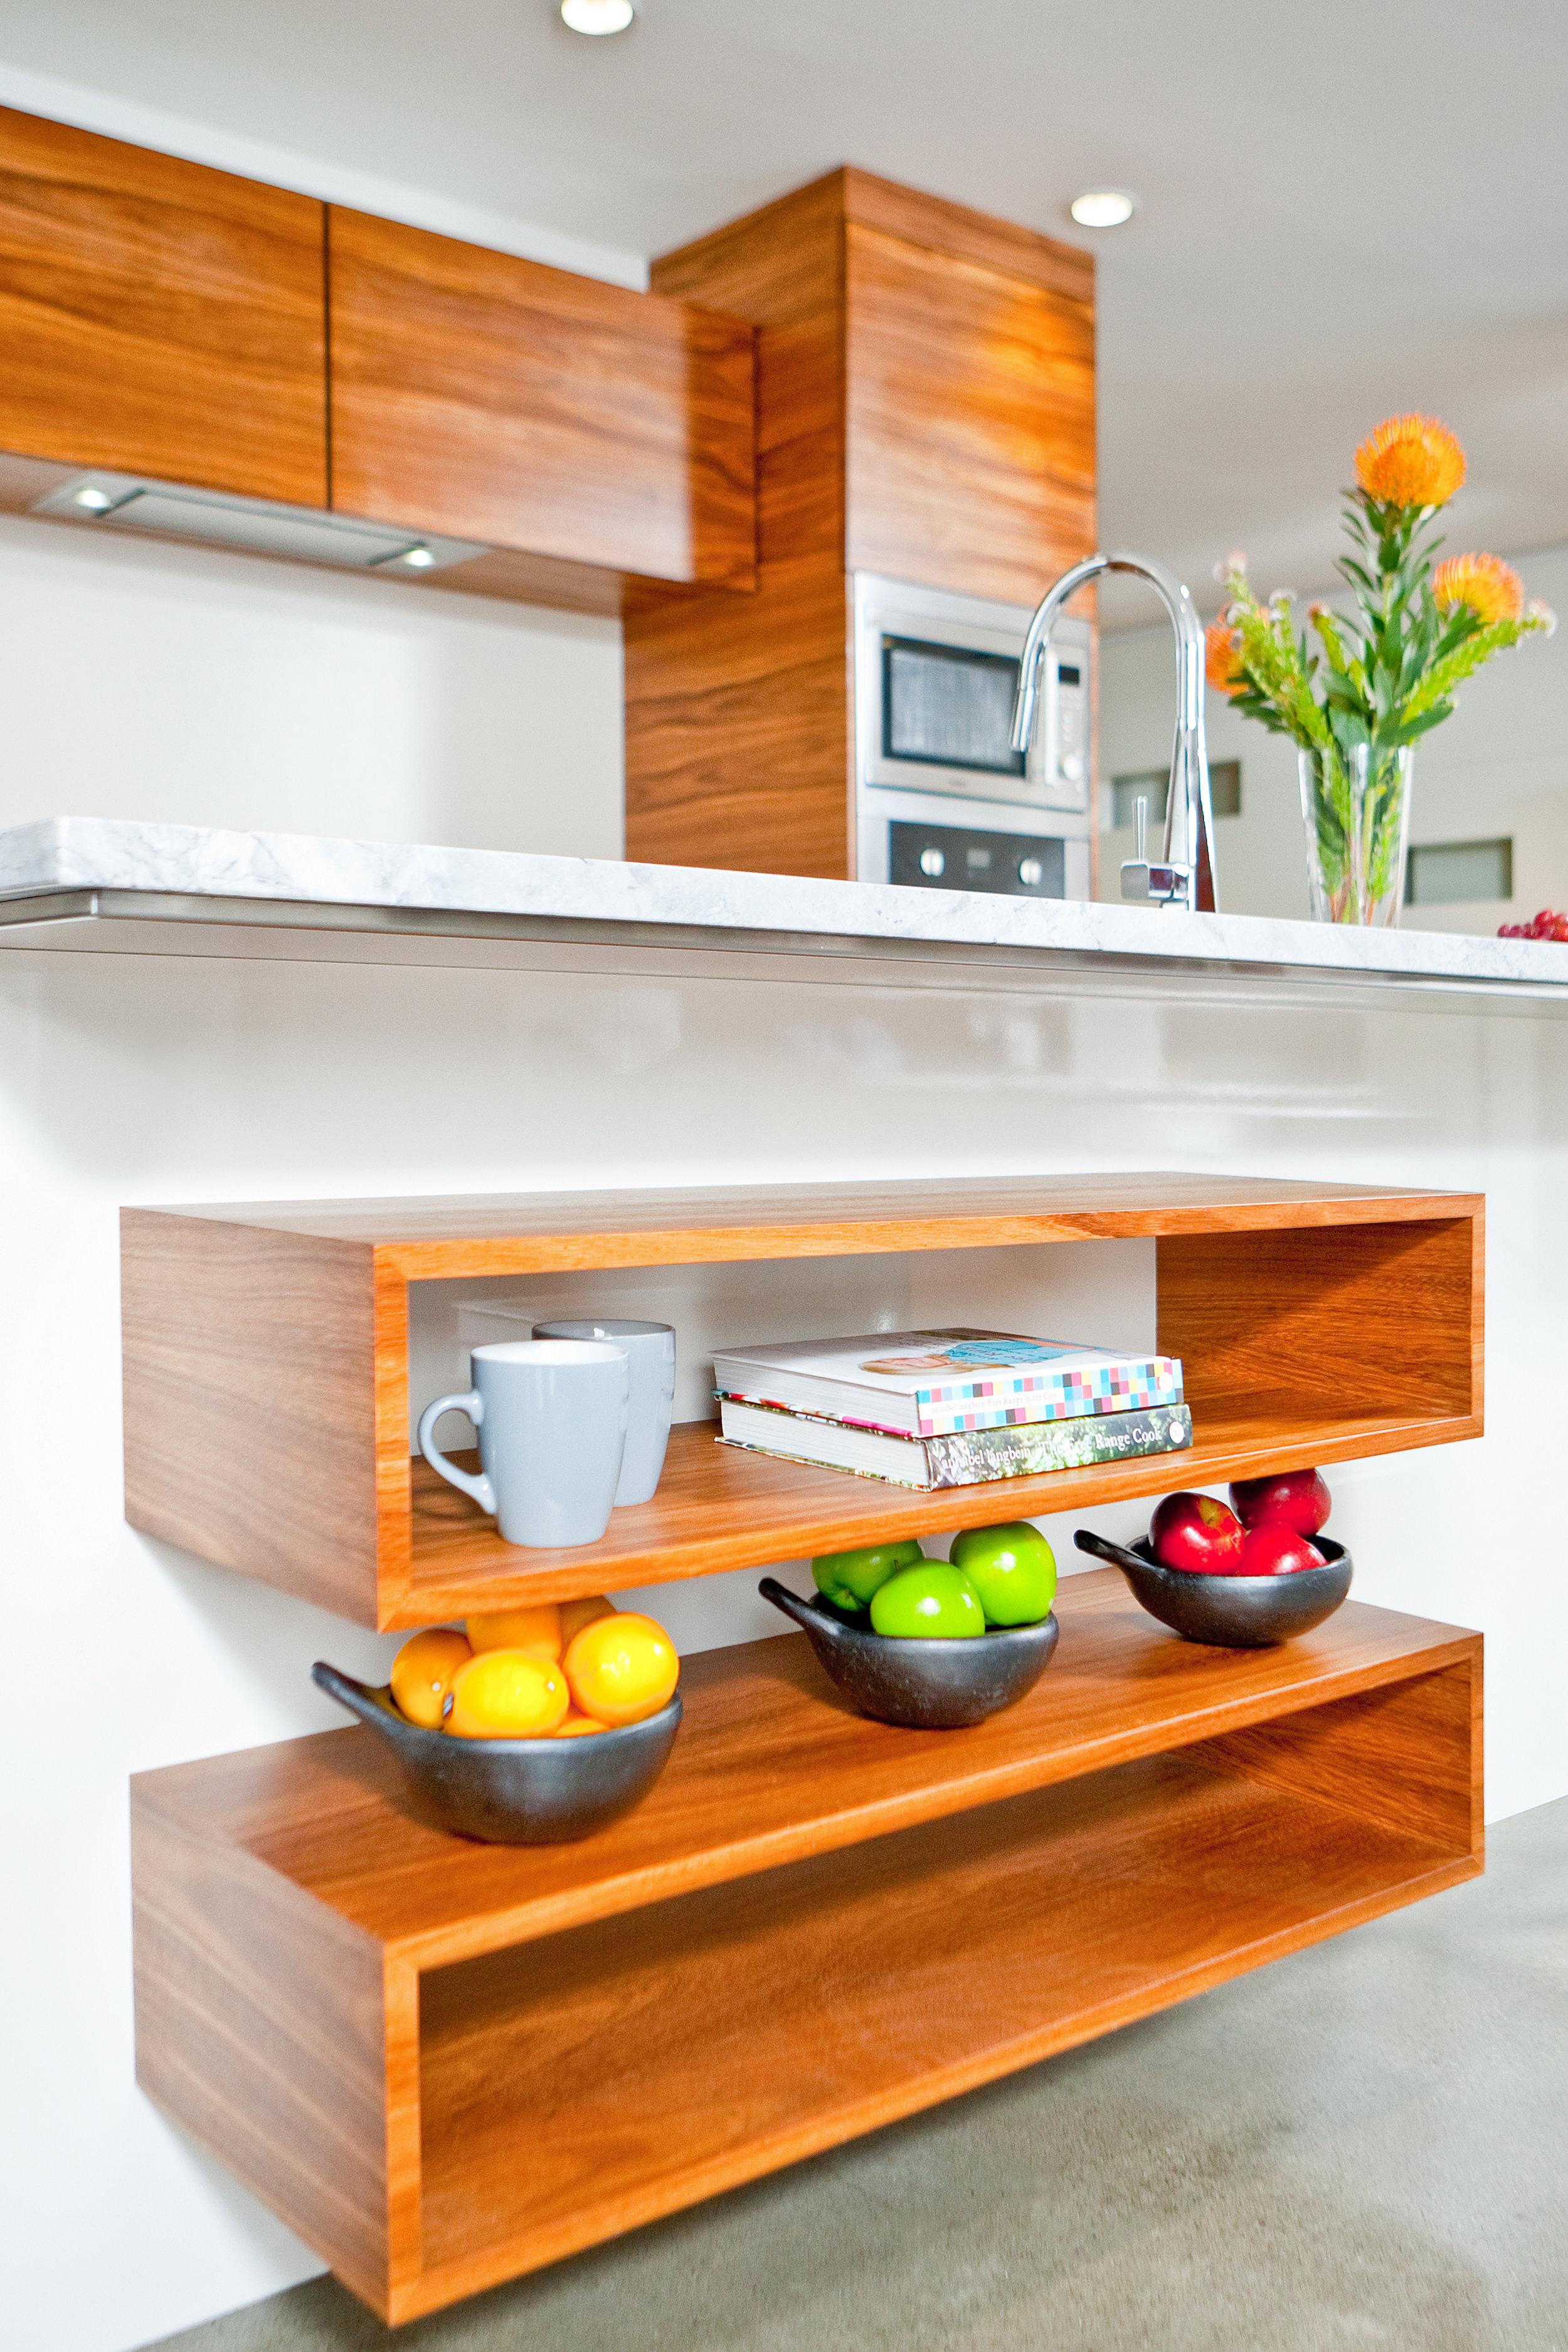 In Haus Design Imagery 124.jpg